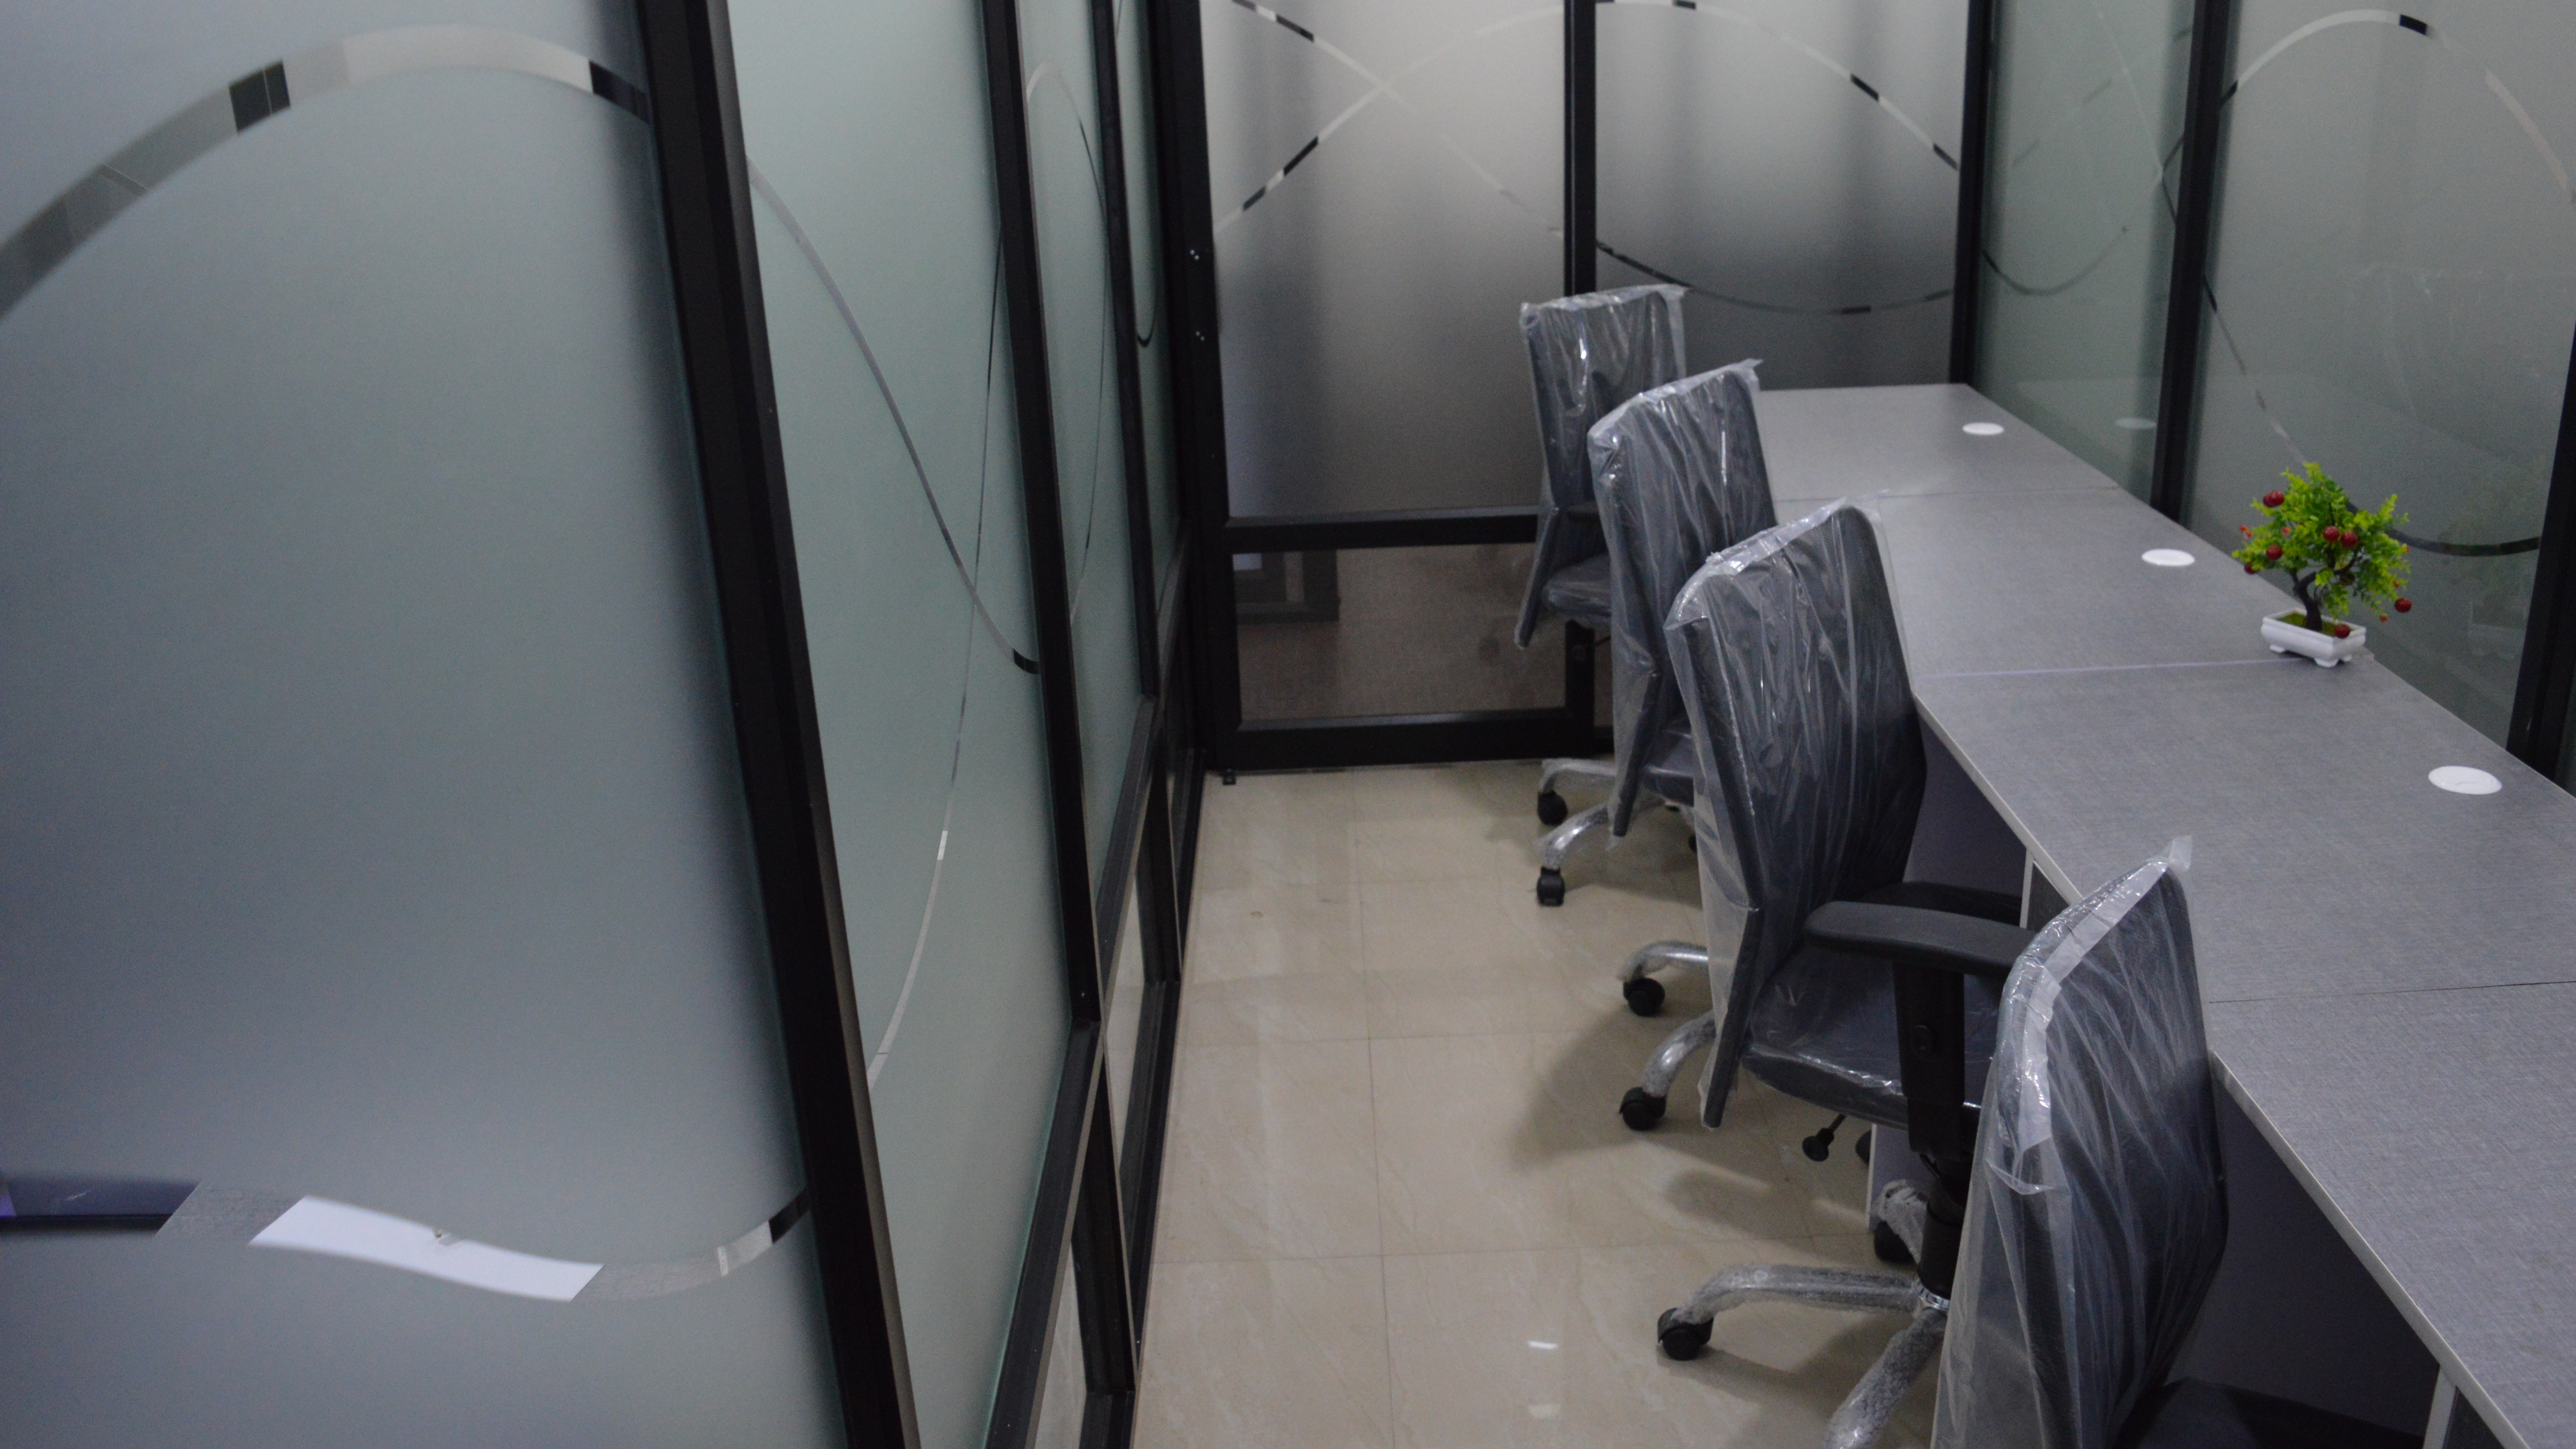 GoOffice 2762 Dedicated Desks | JP Nagar 7 phase